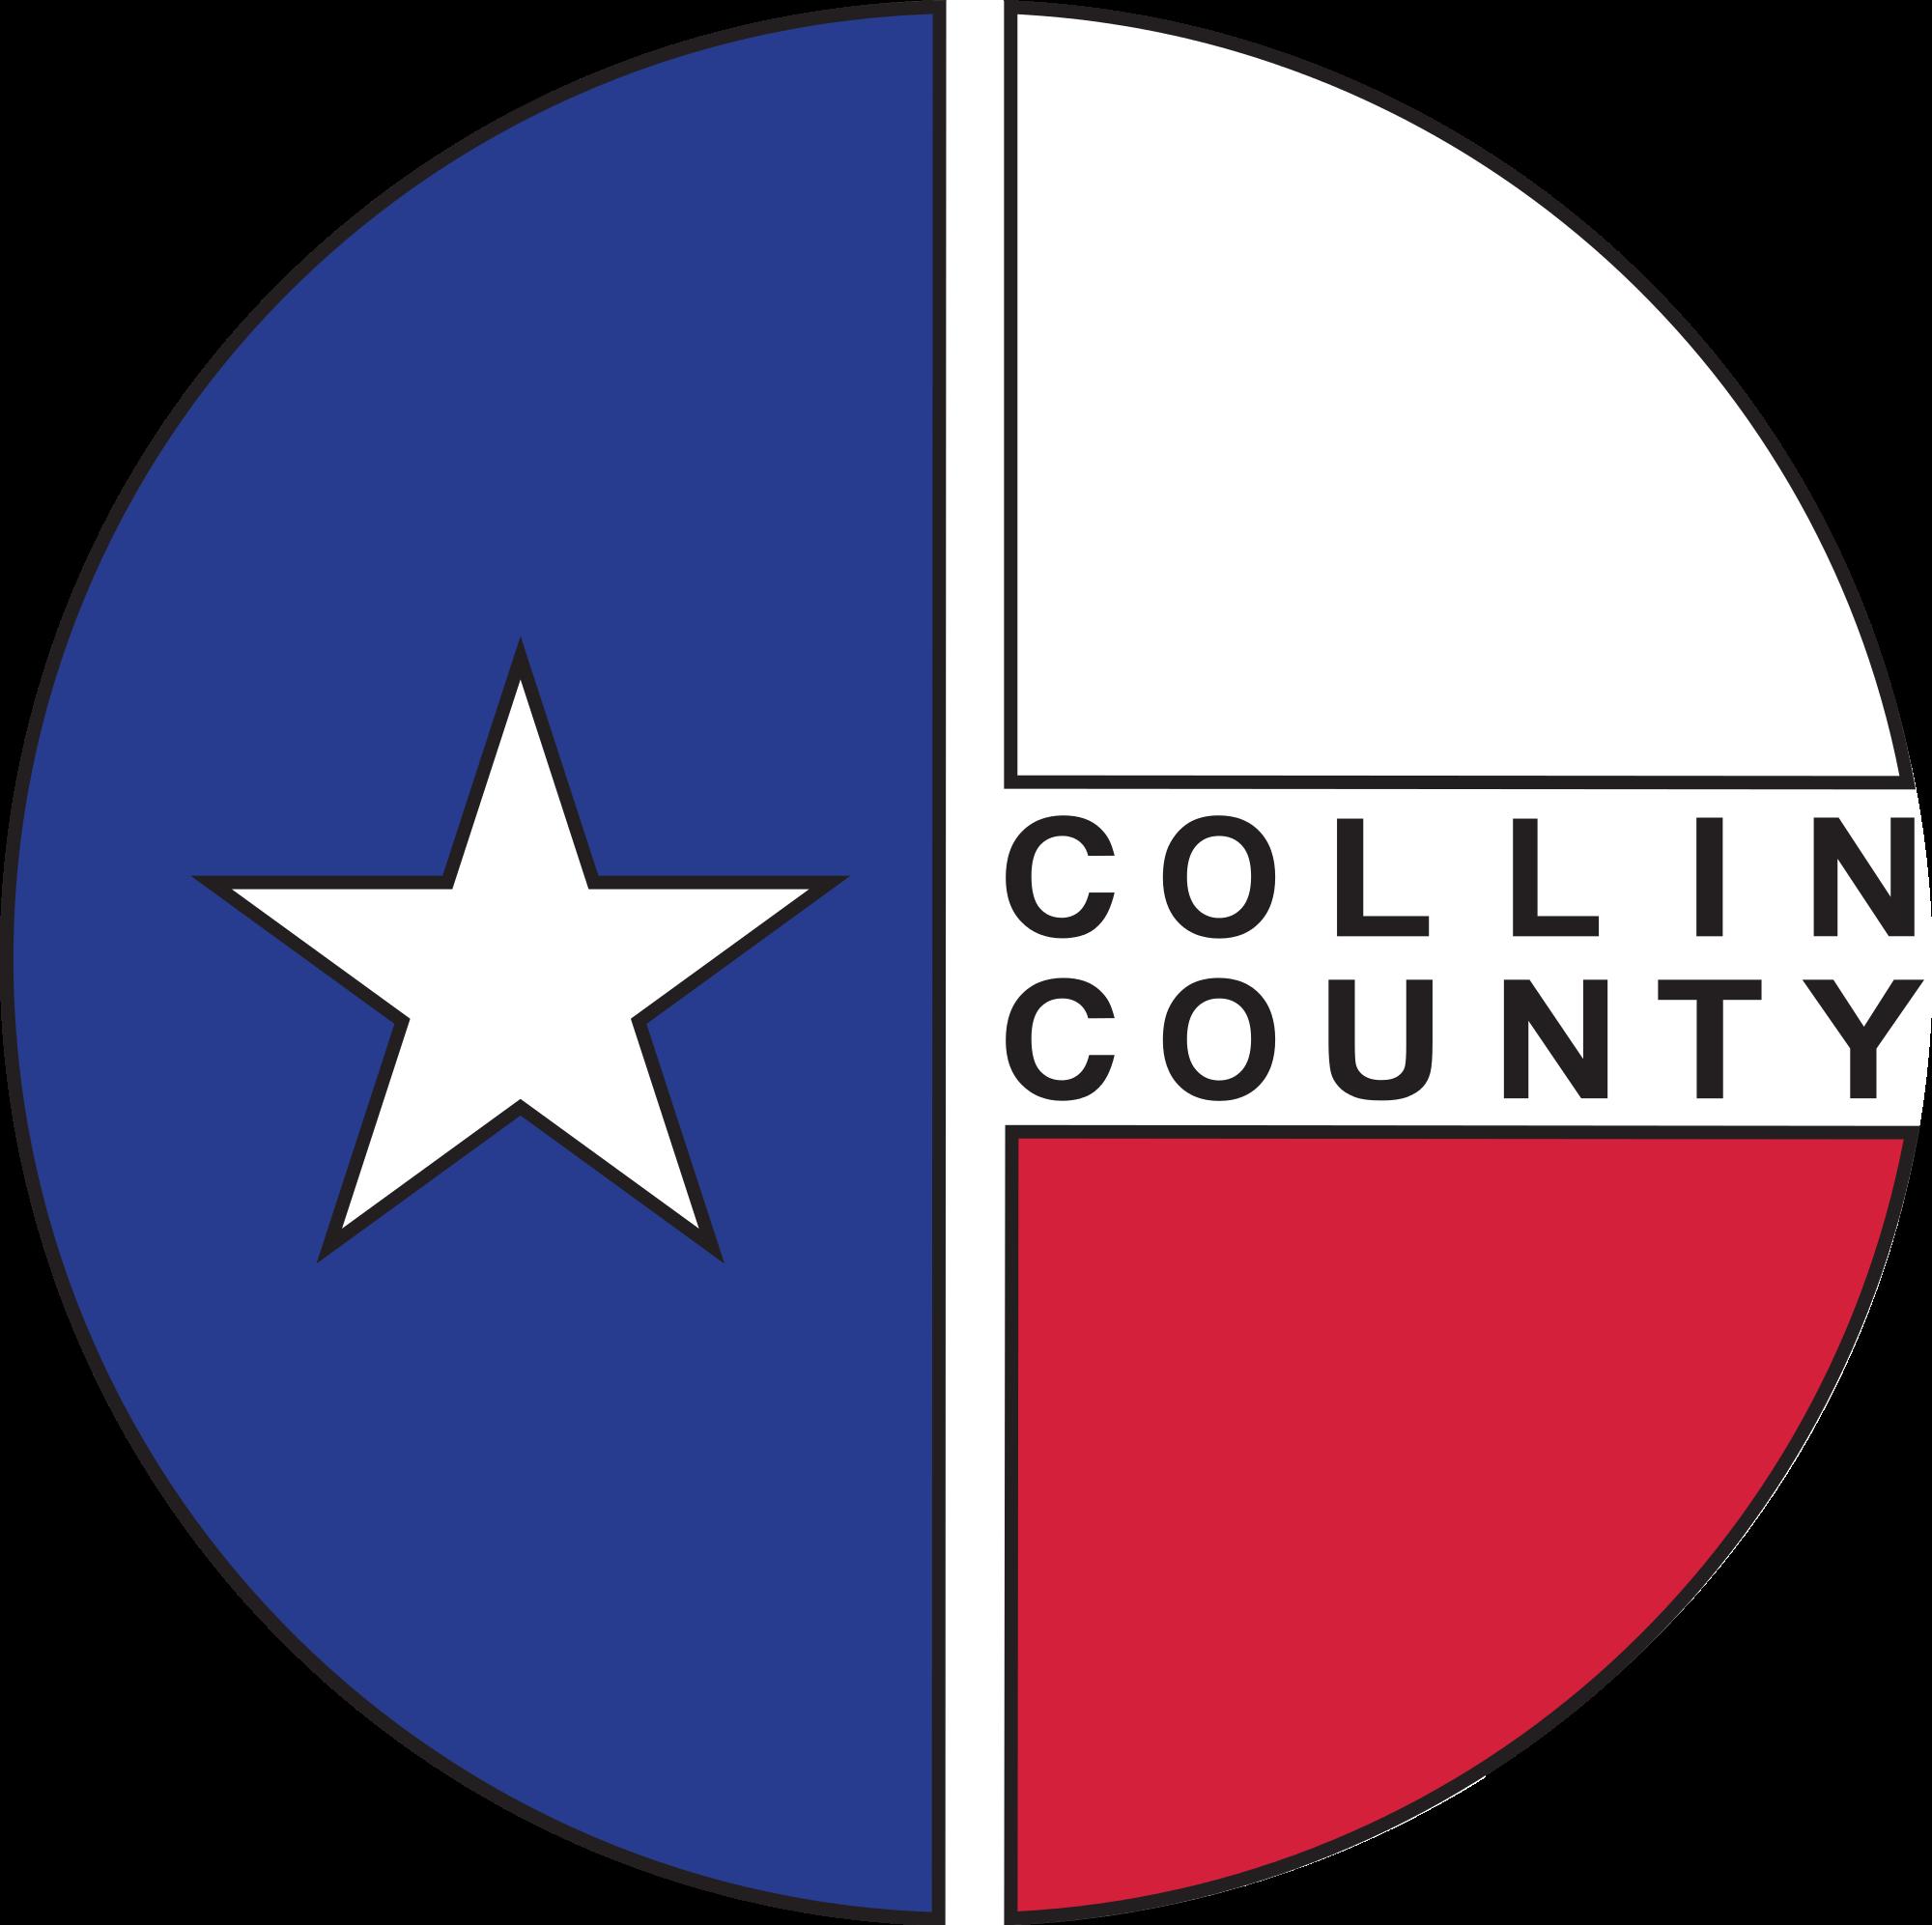 collin county